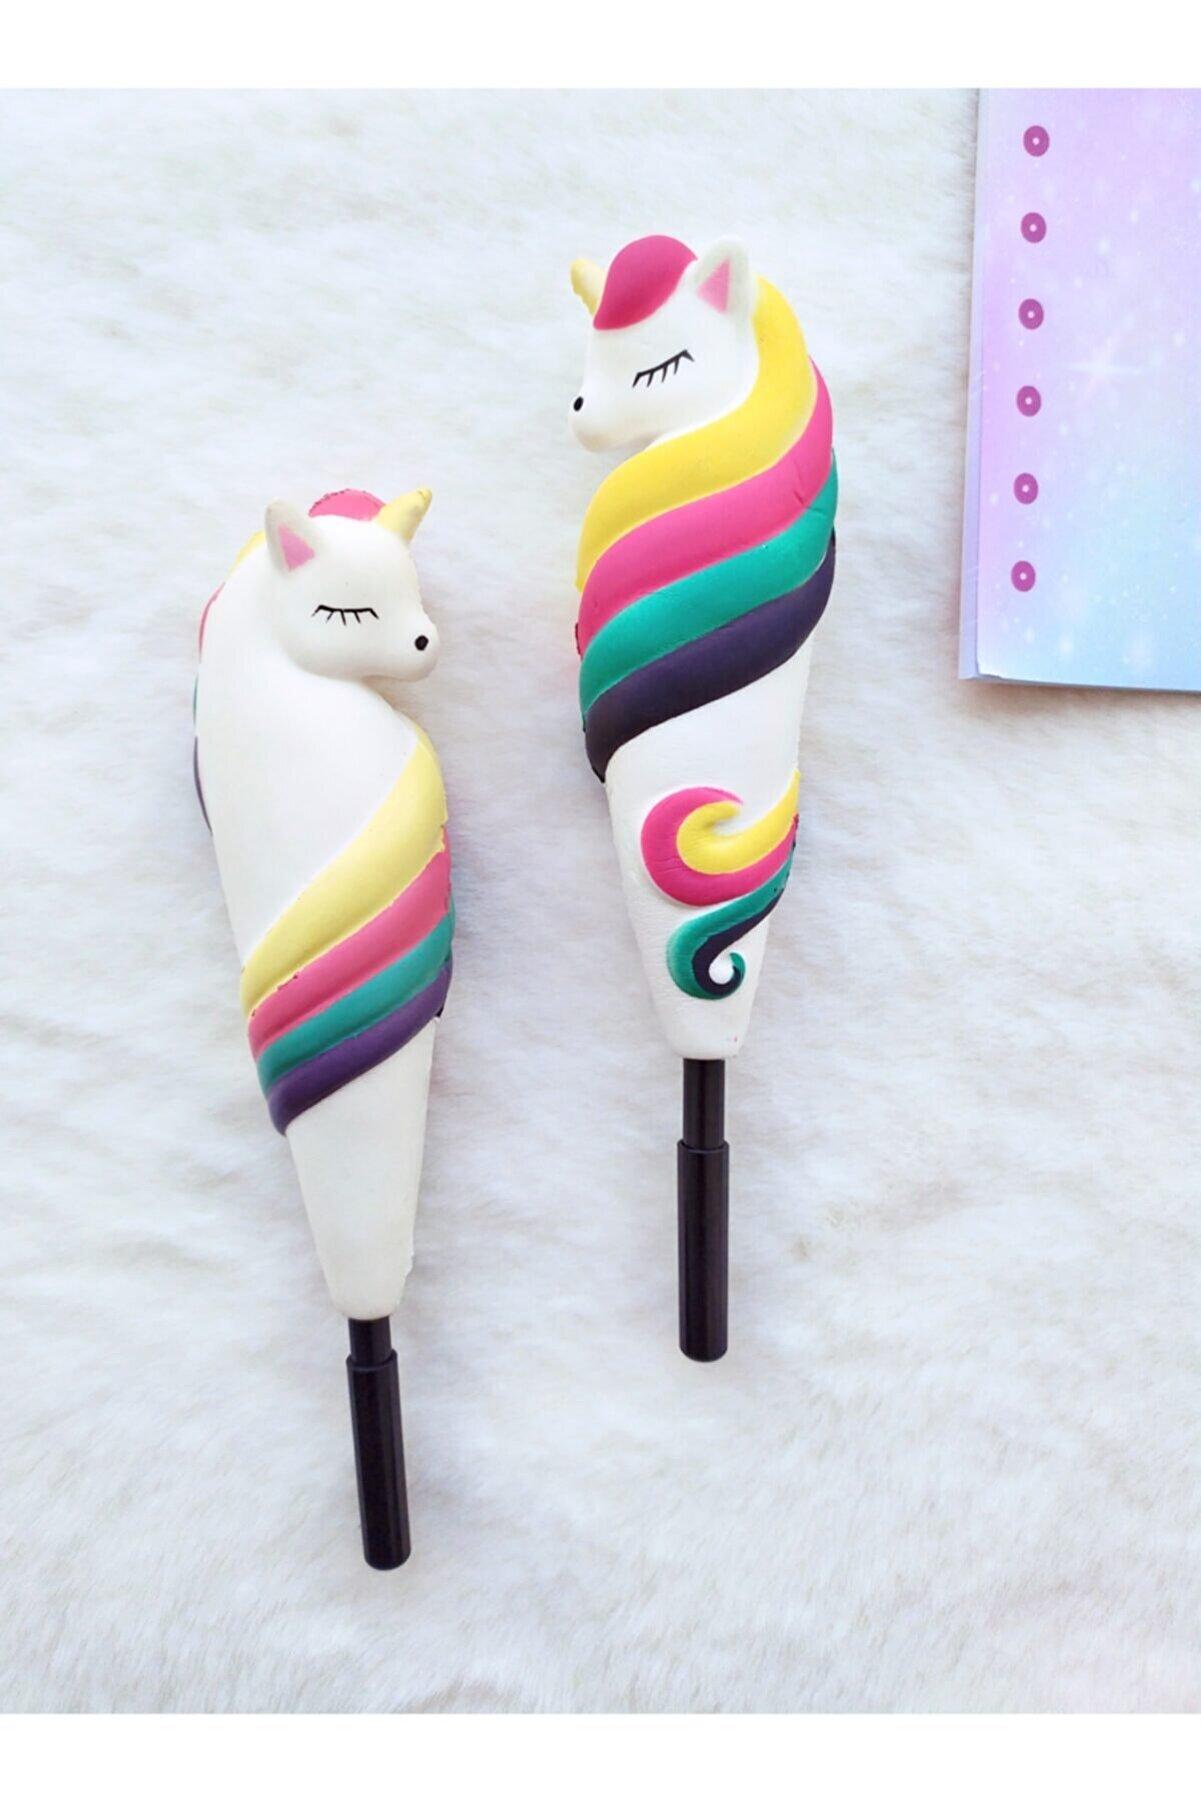 Pembe Çarşı Renkli Unicorn Squishy Jel Kalem